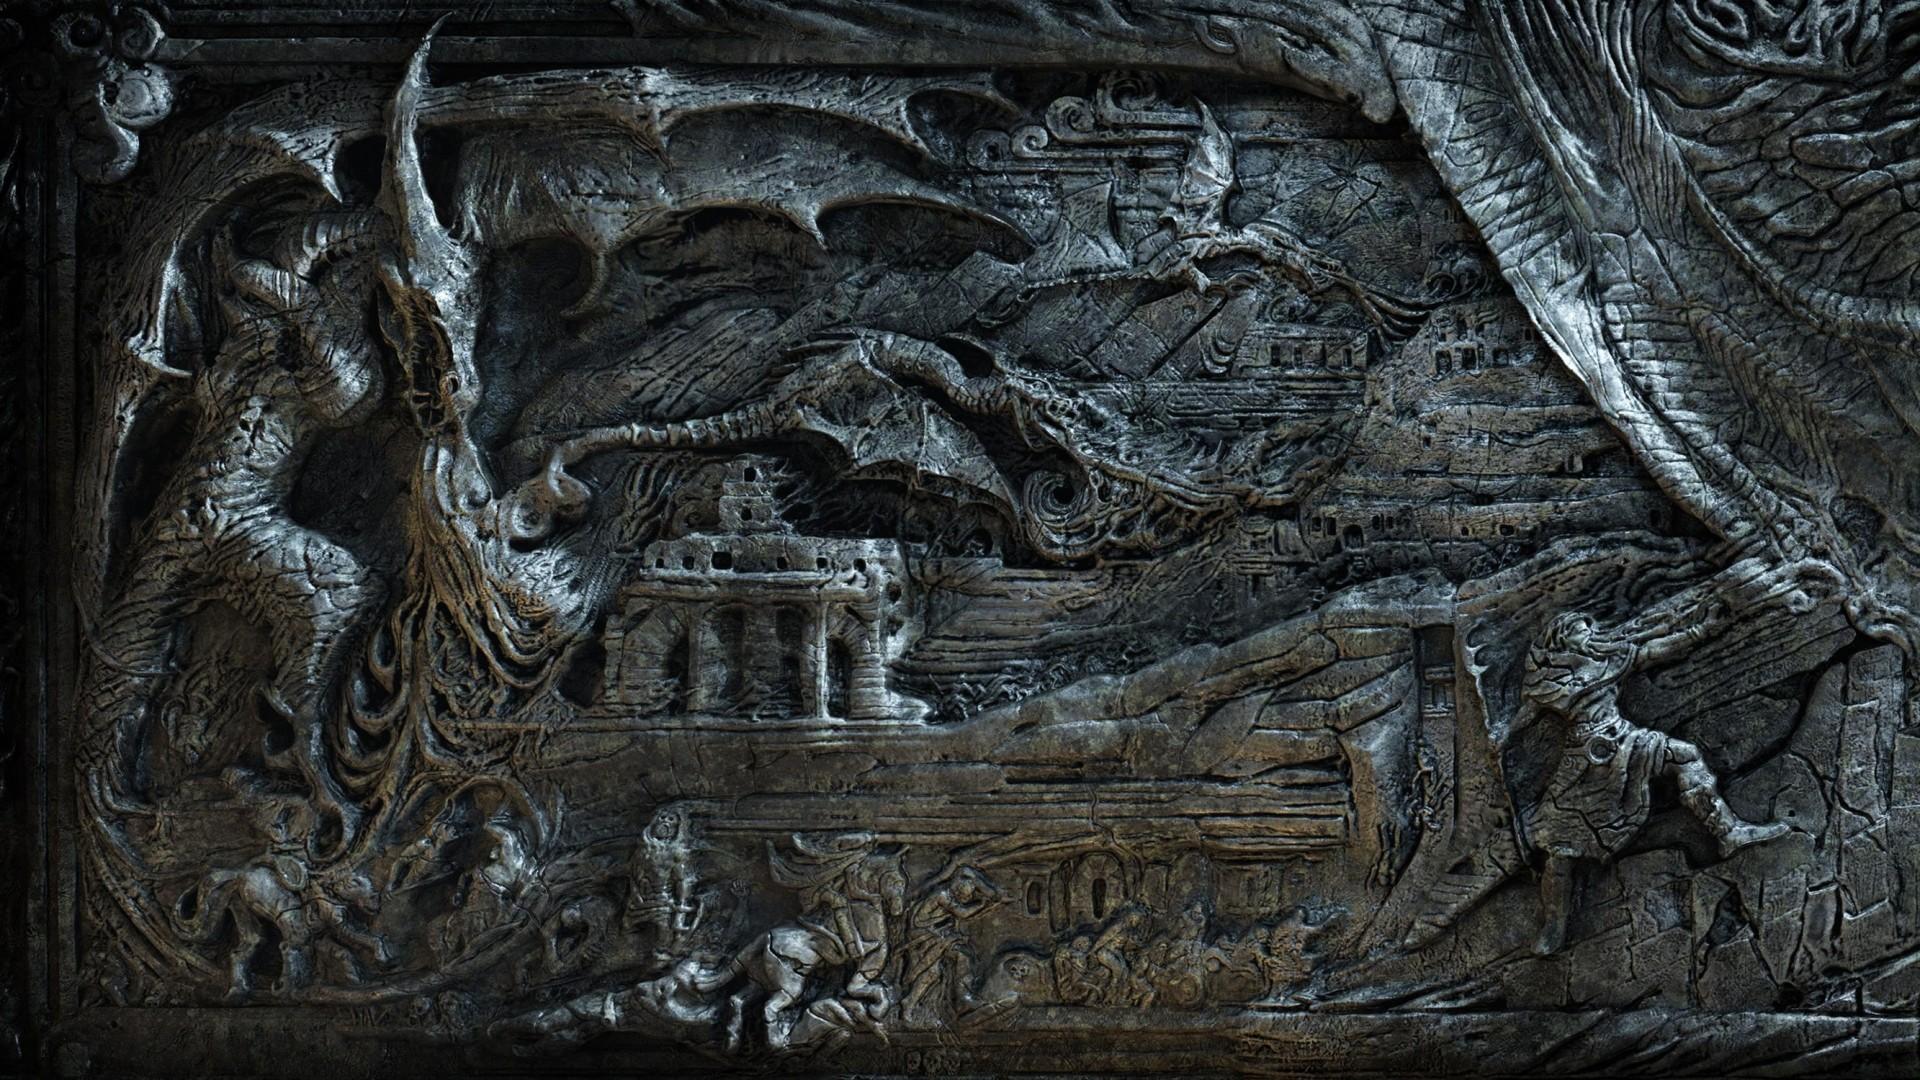 Preview the elder scrolls v skyrim